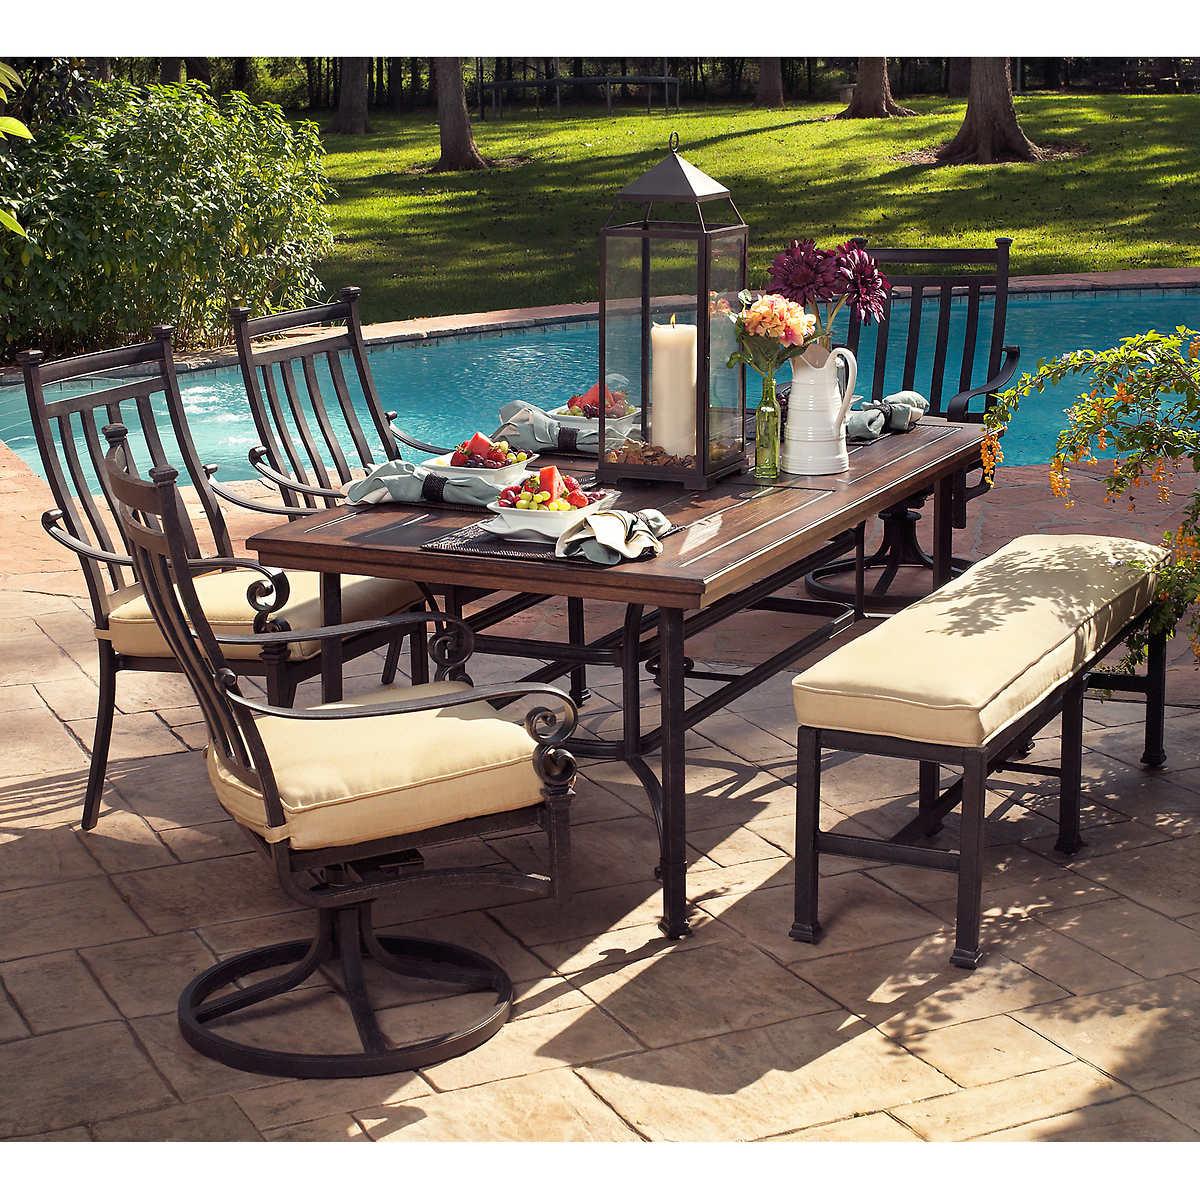 Outdoor Patio Dining Furniture meridian 6-piece patio dining set